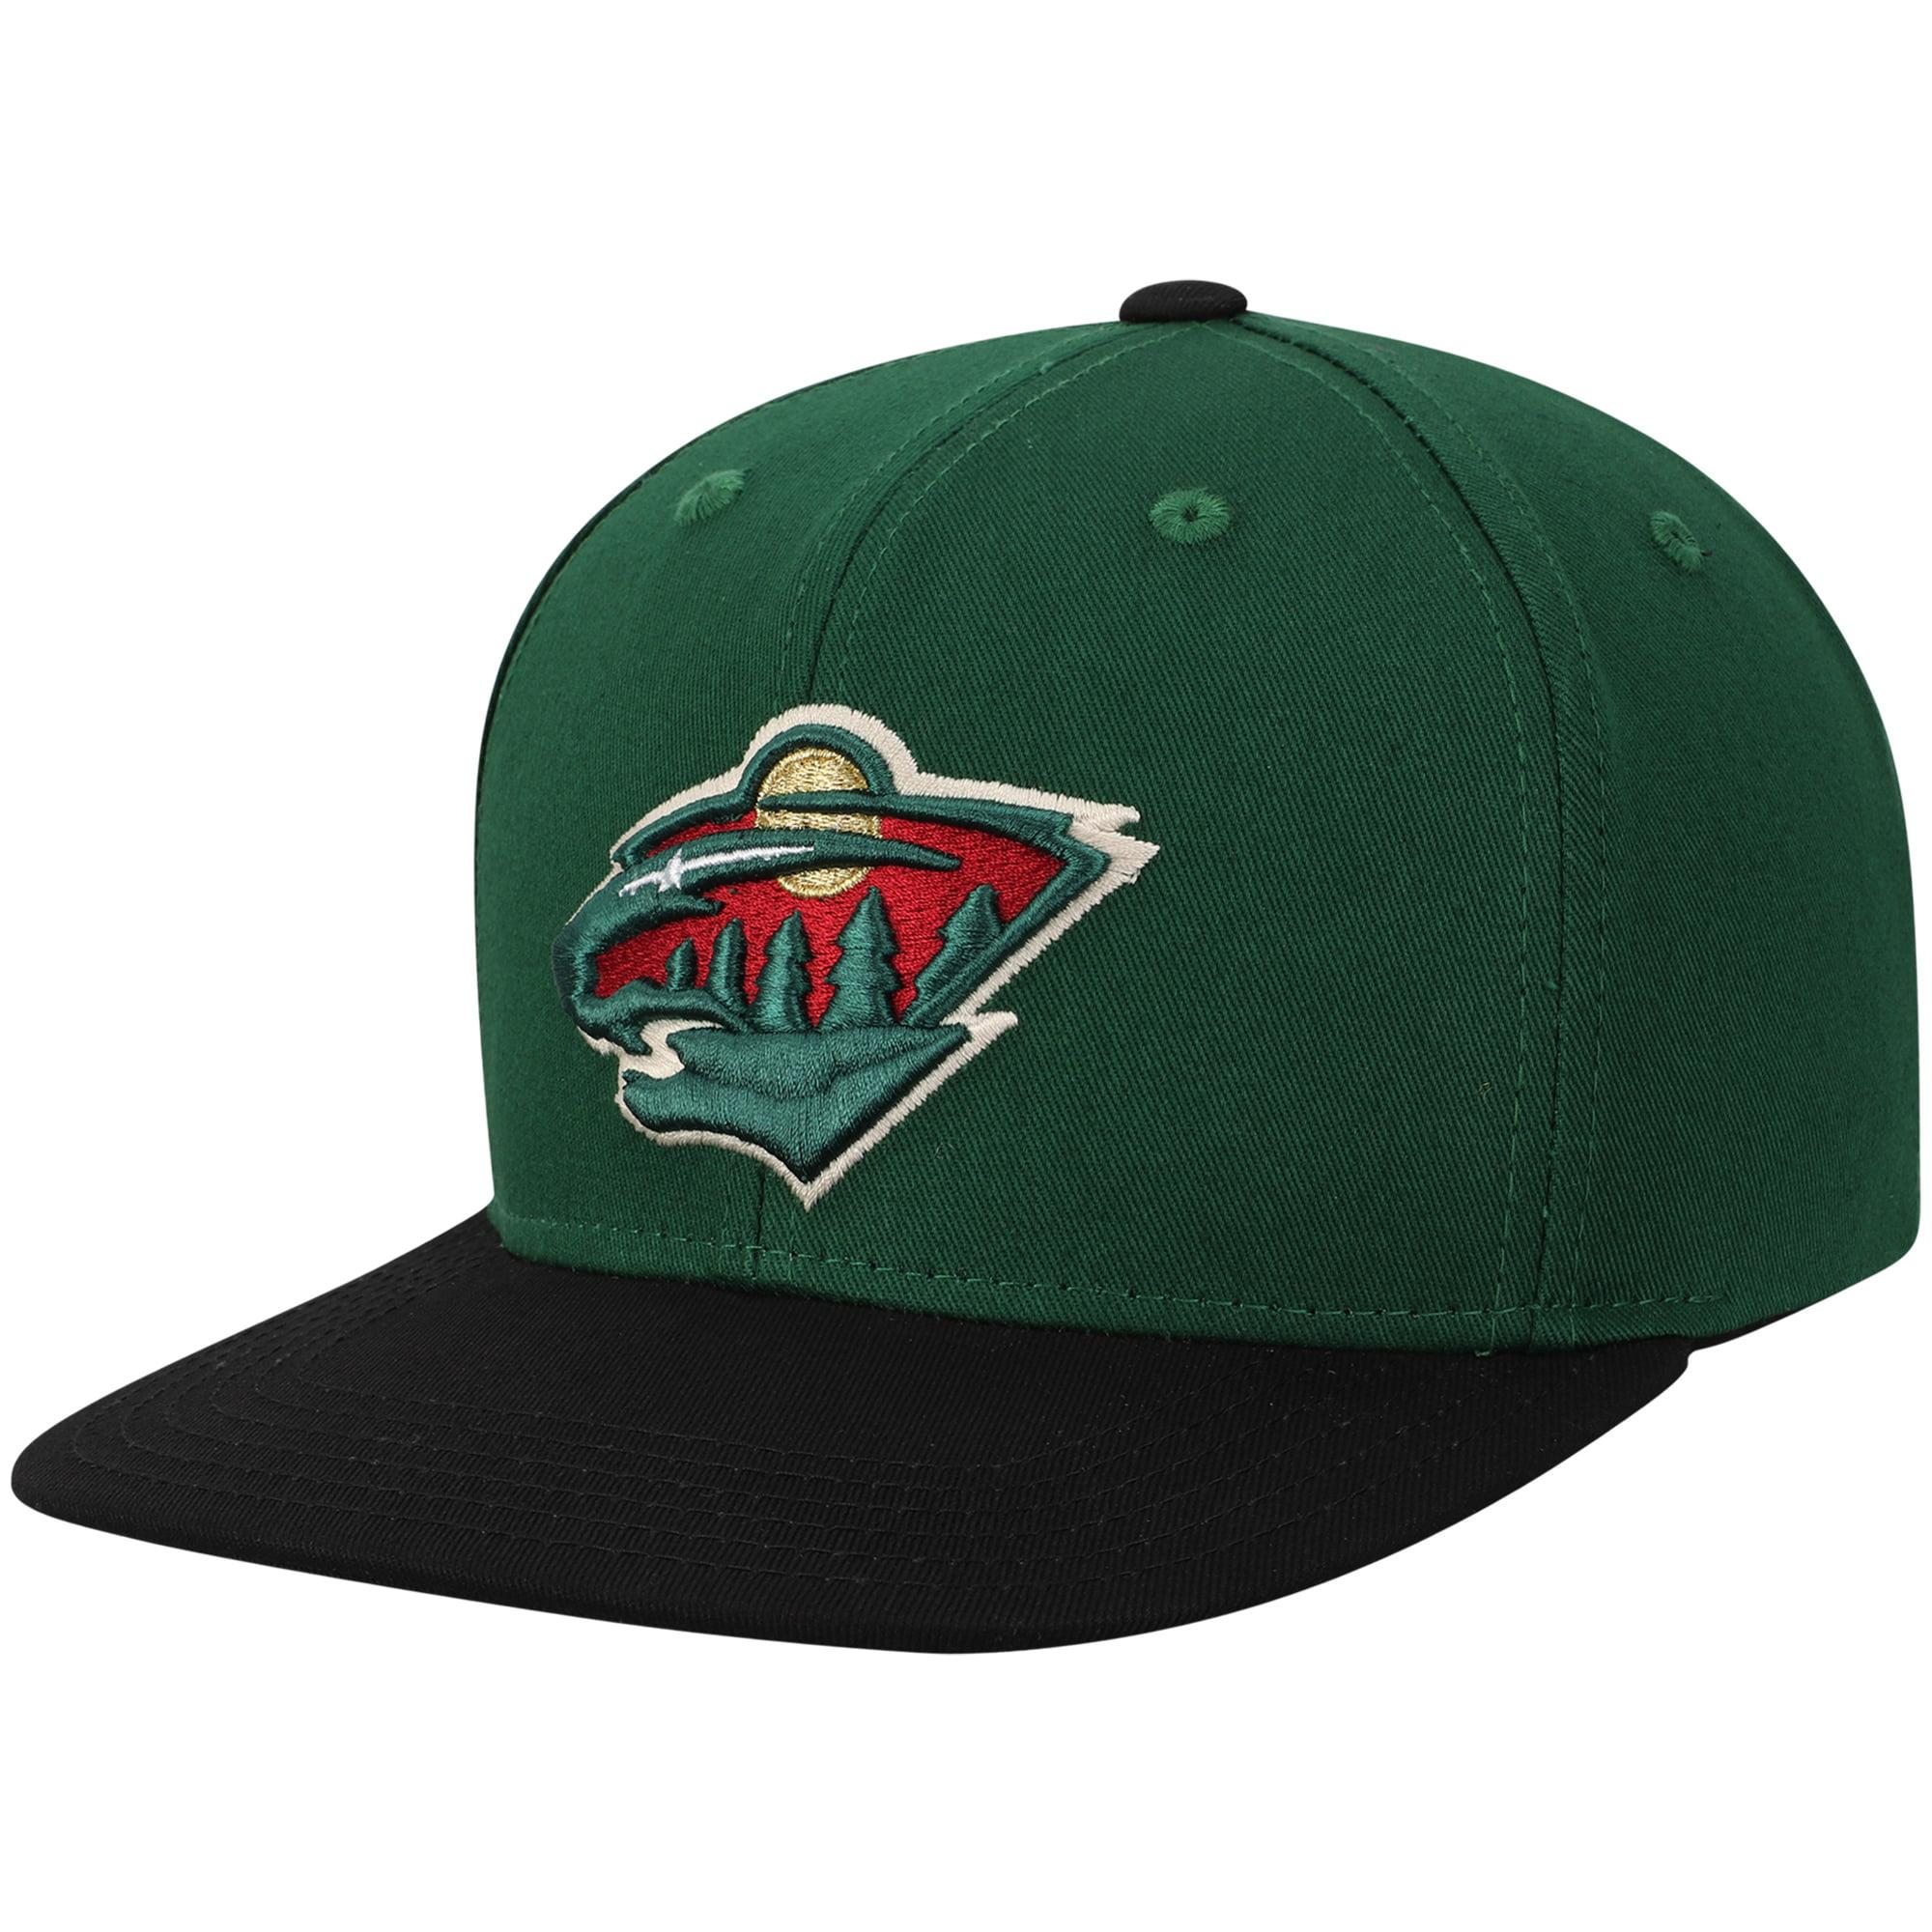 Minnesota Wild Youth Two-Tone Flatbrim Snapback Adjustable Hat - Green/Black - OSFA